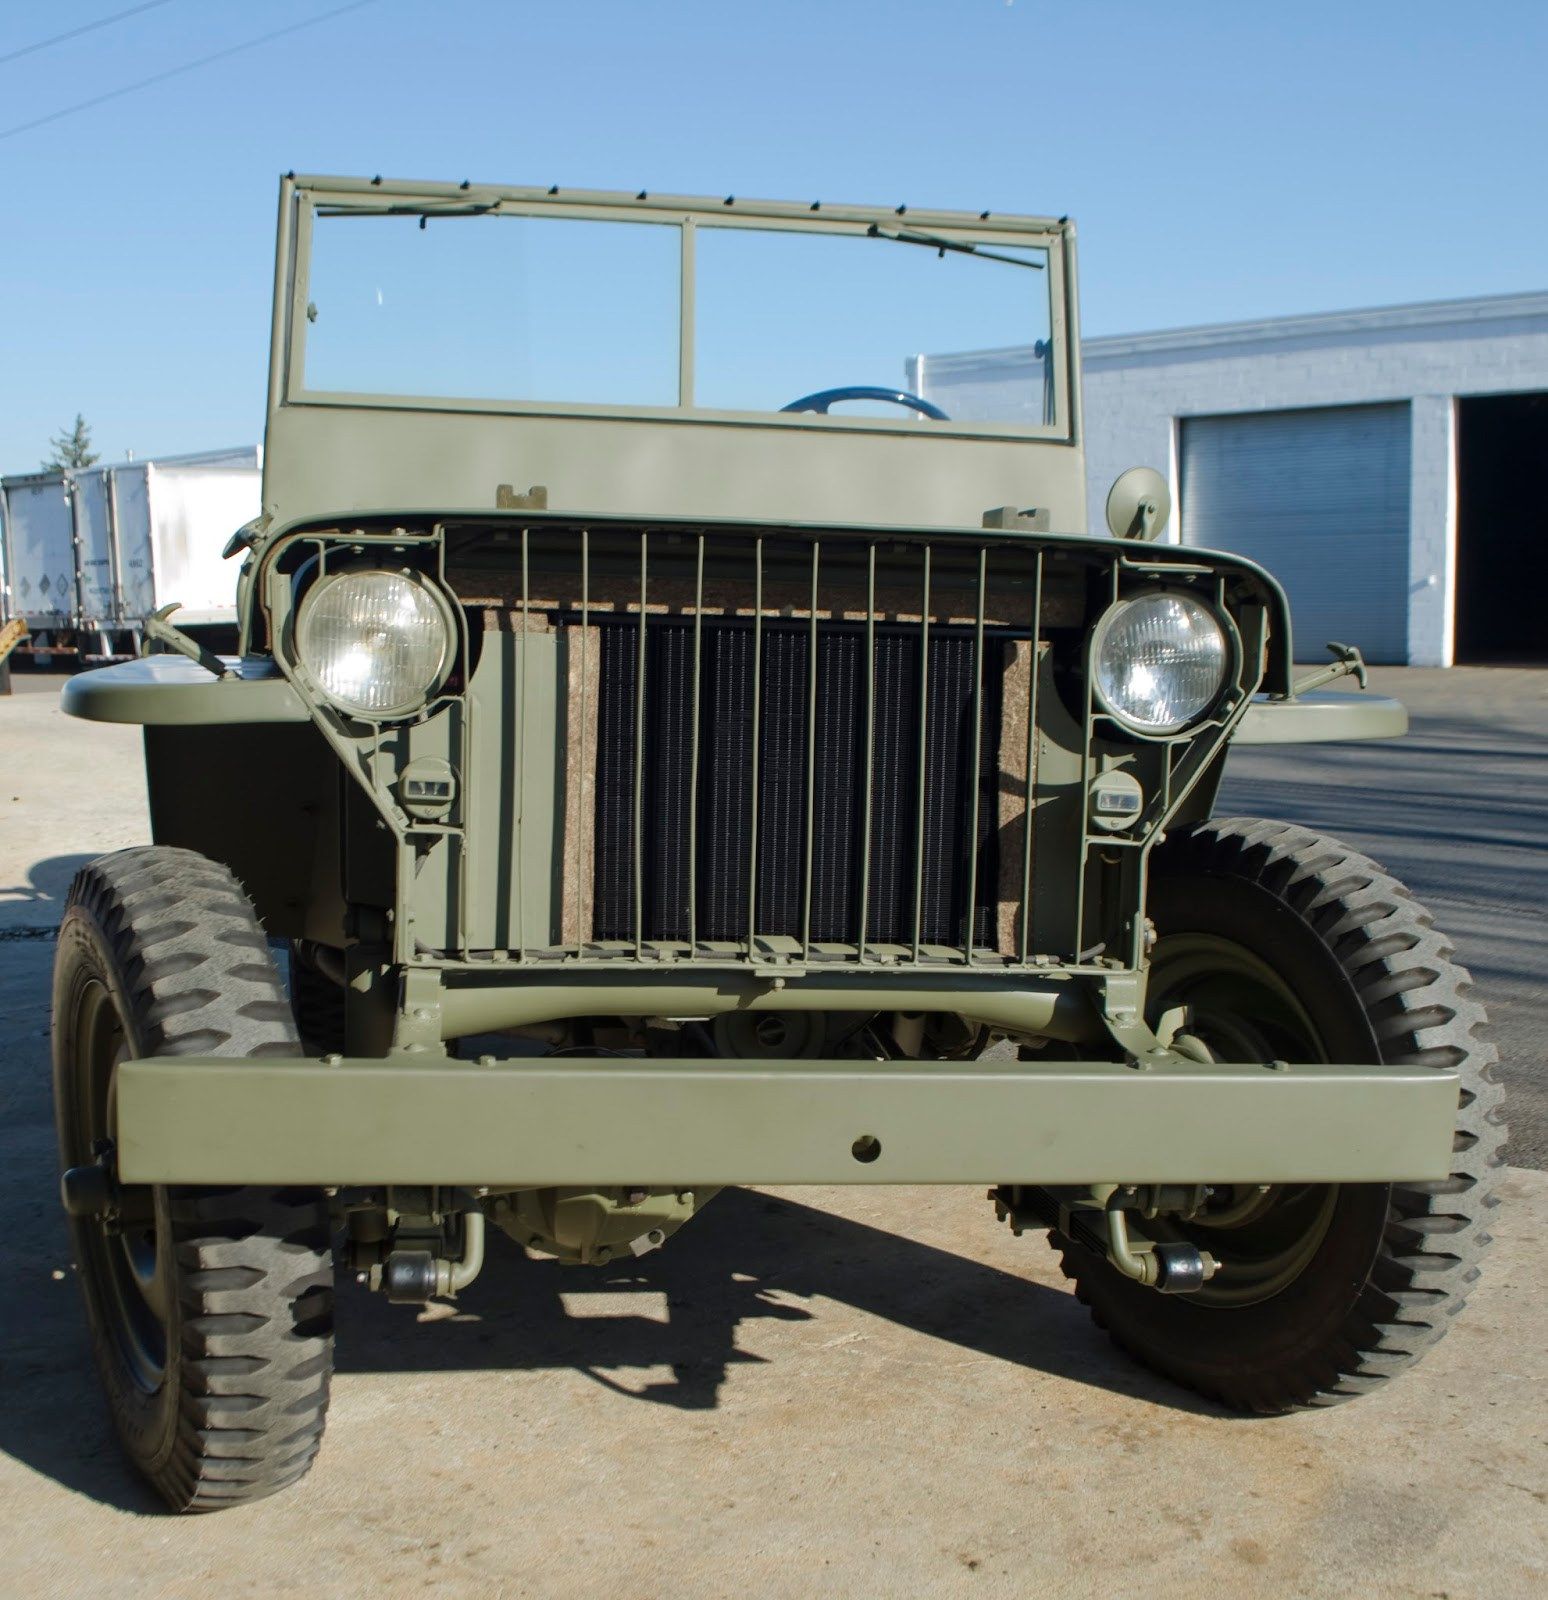 War Jeep Stories: The Original Willys Jeep | 1941 Slat ...